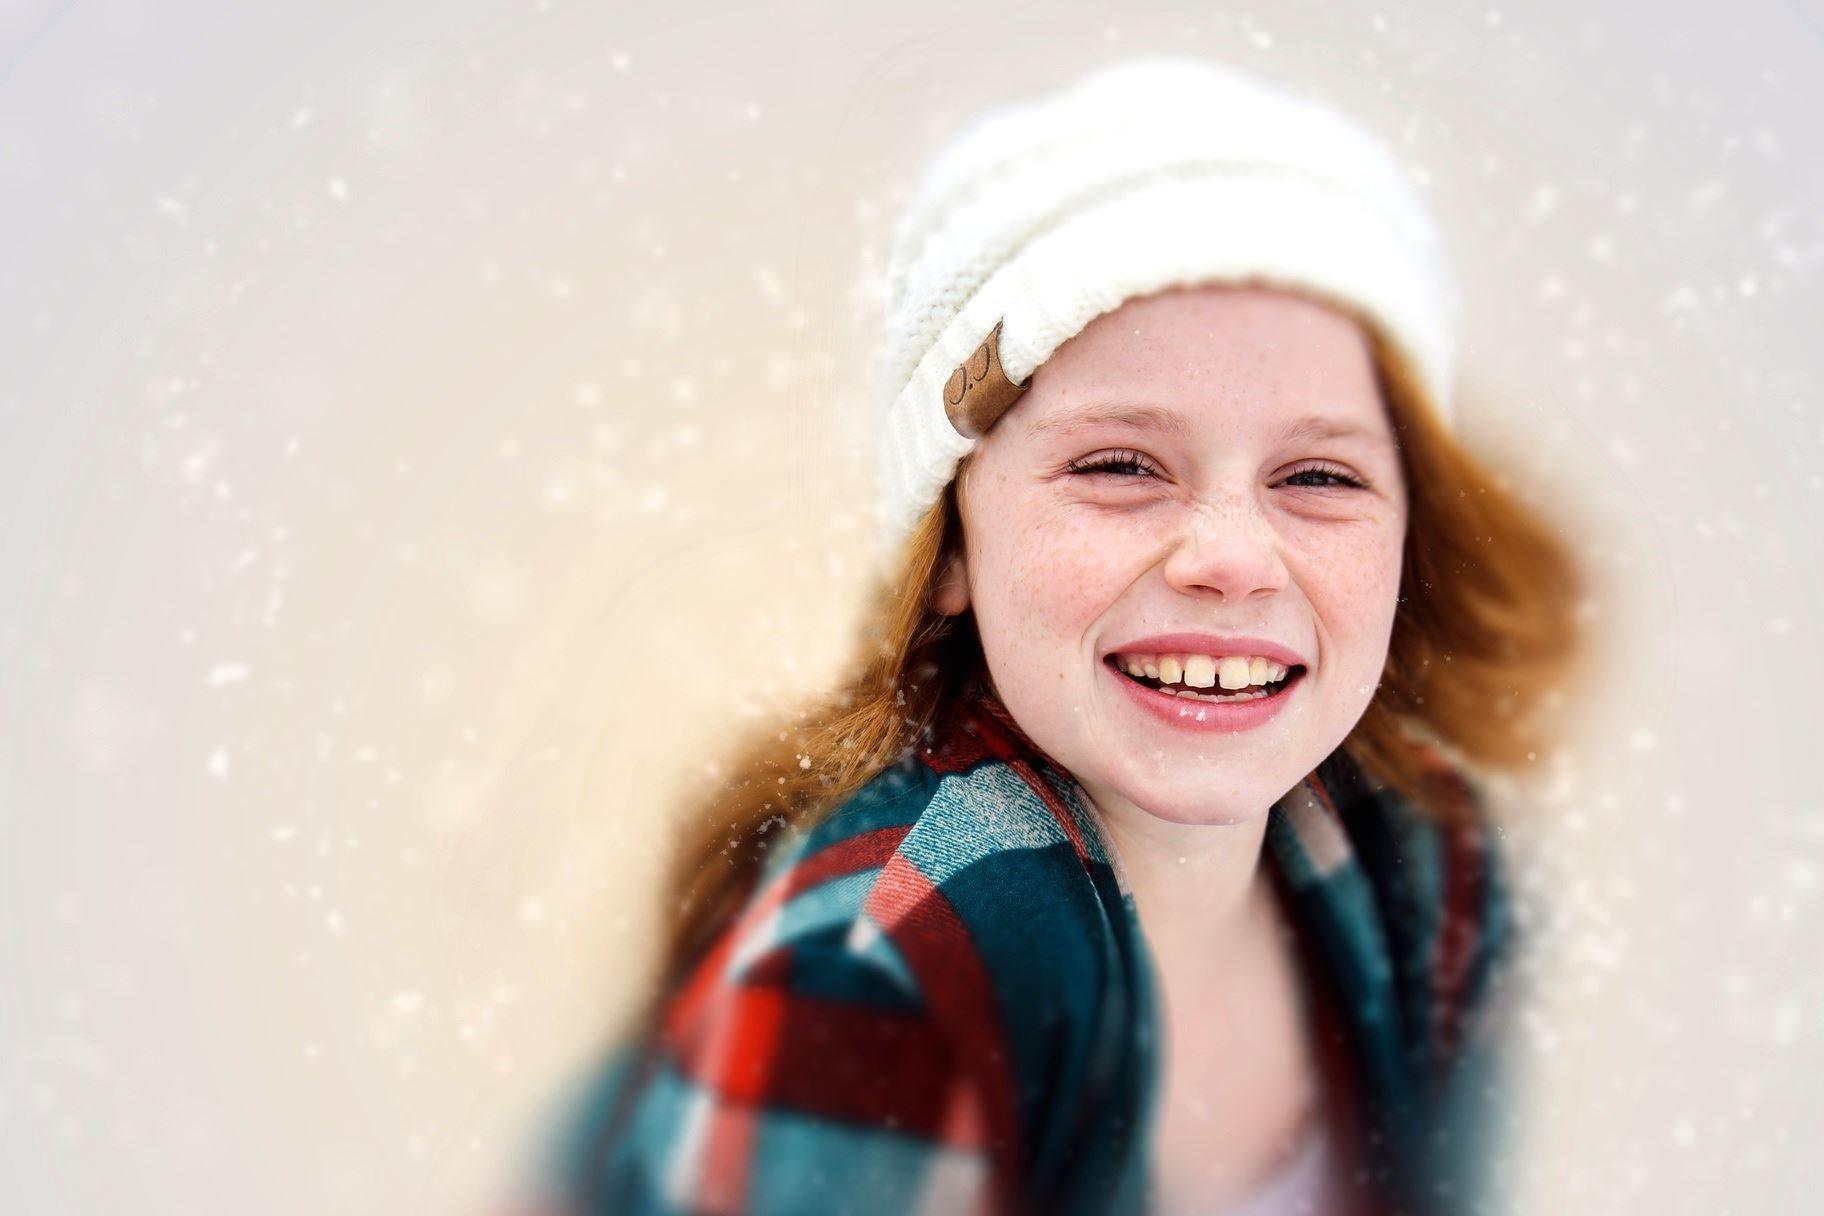 cute kids photos free download